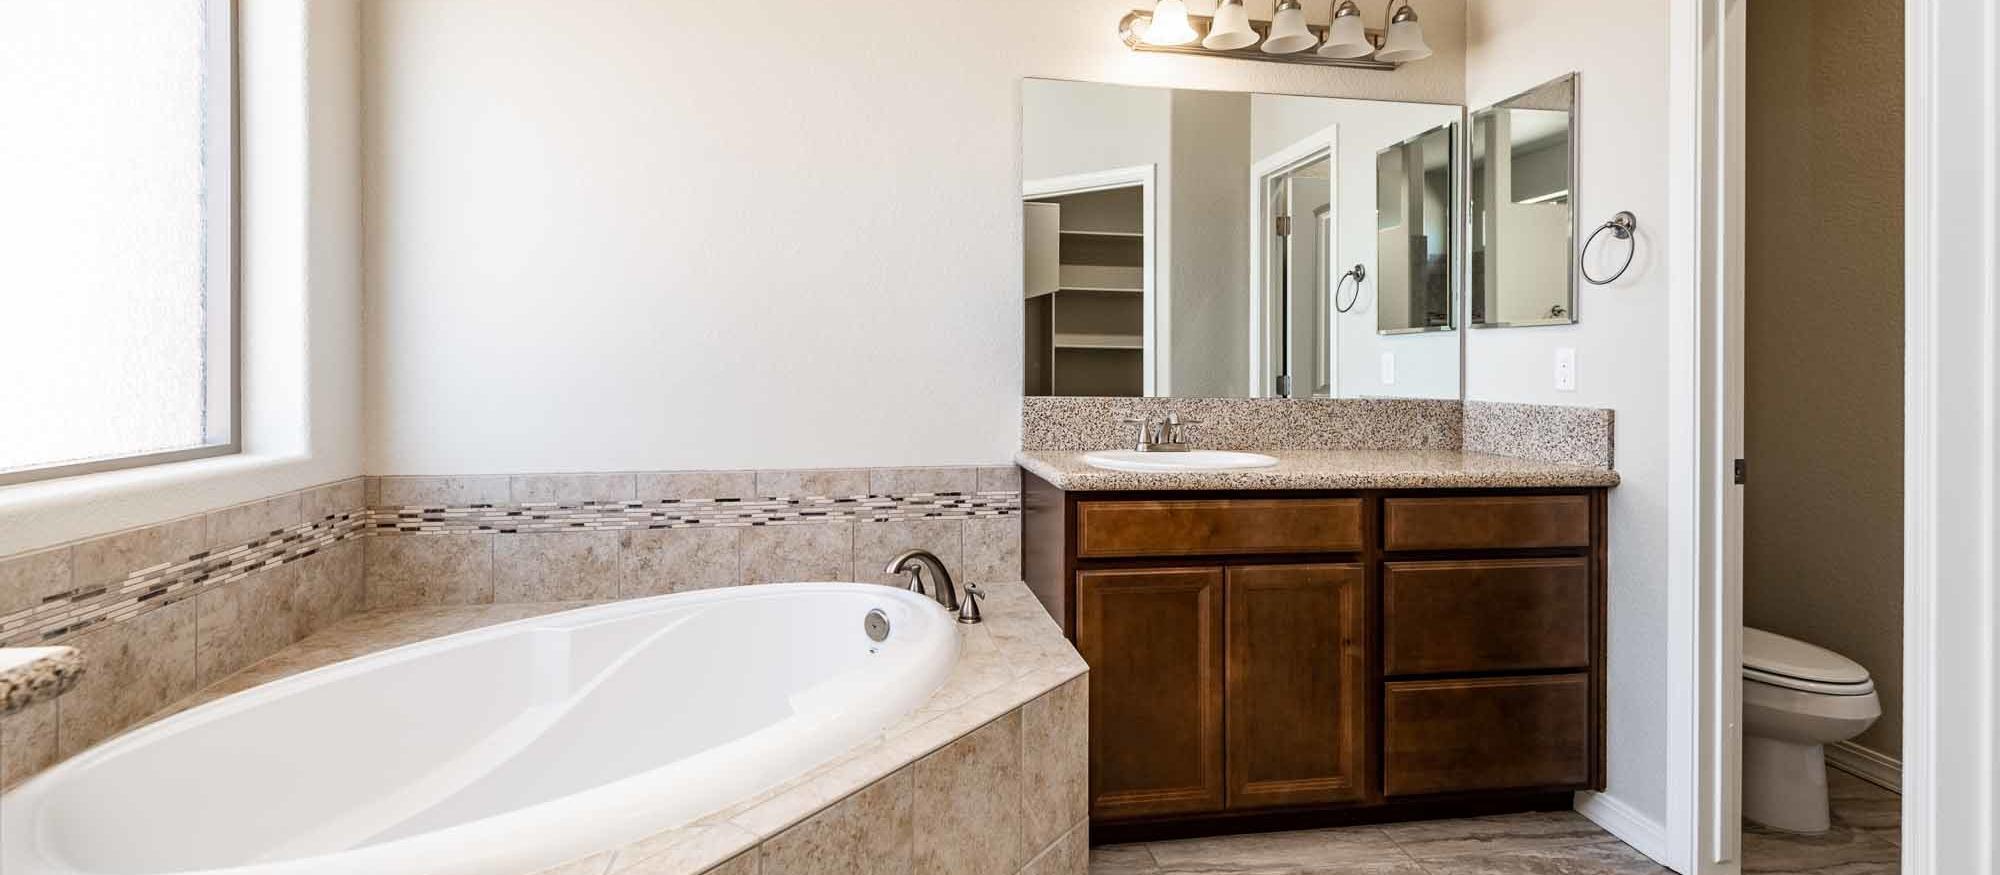 Bathroom featured in the Ocotillo 2084 By Angle Homes in Kingman-Lake Havasu City, AZ